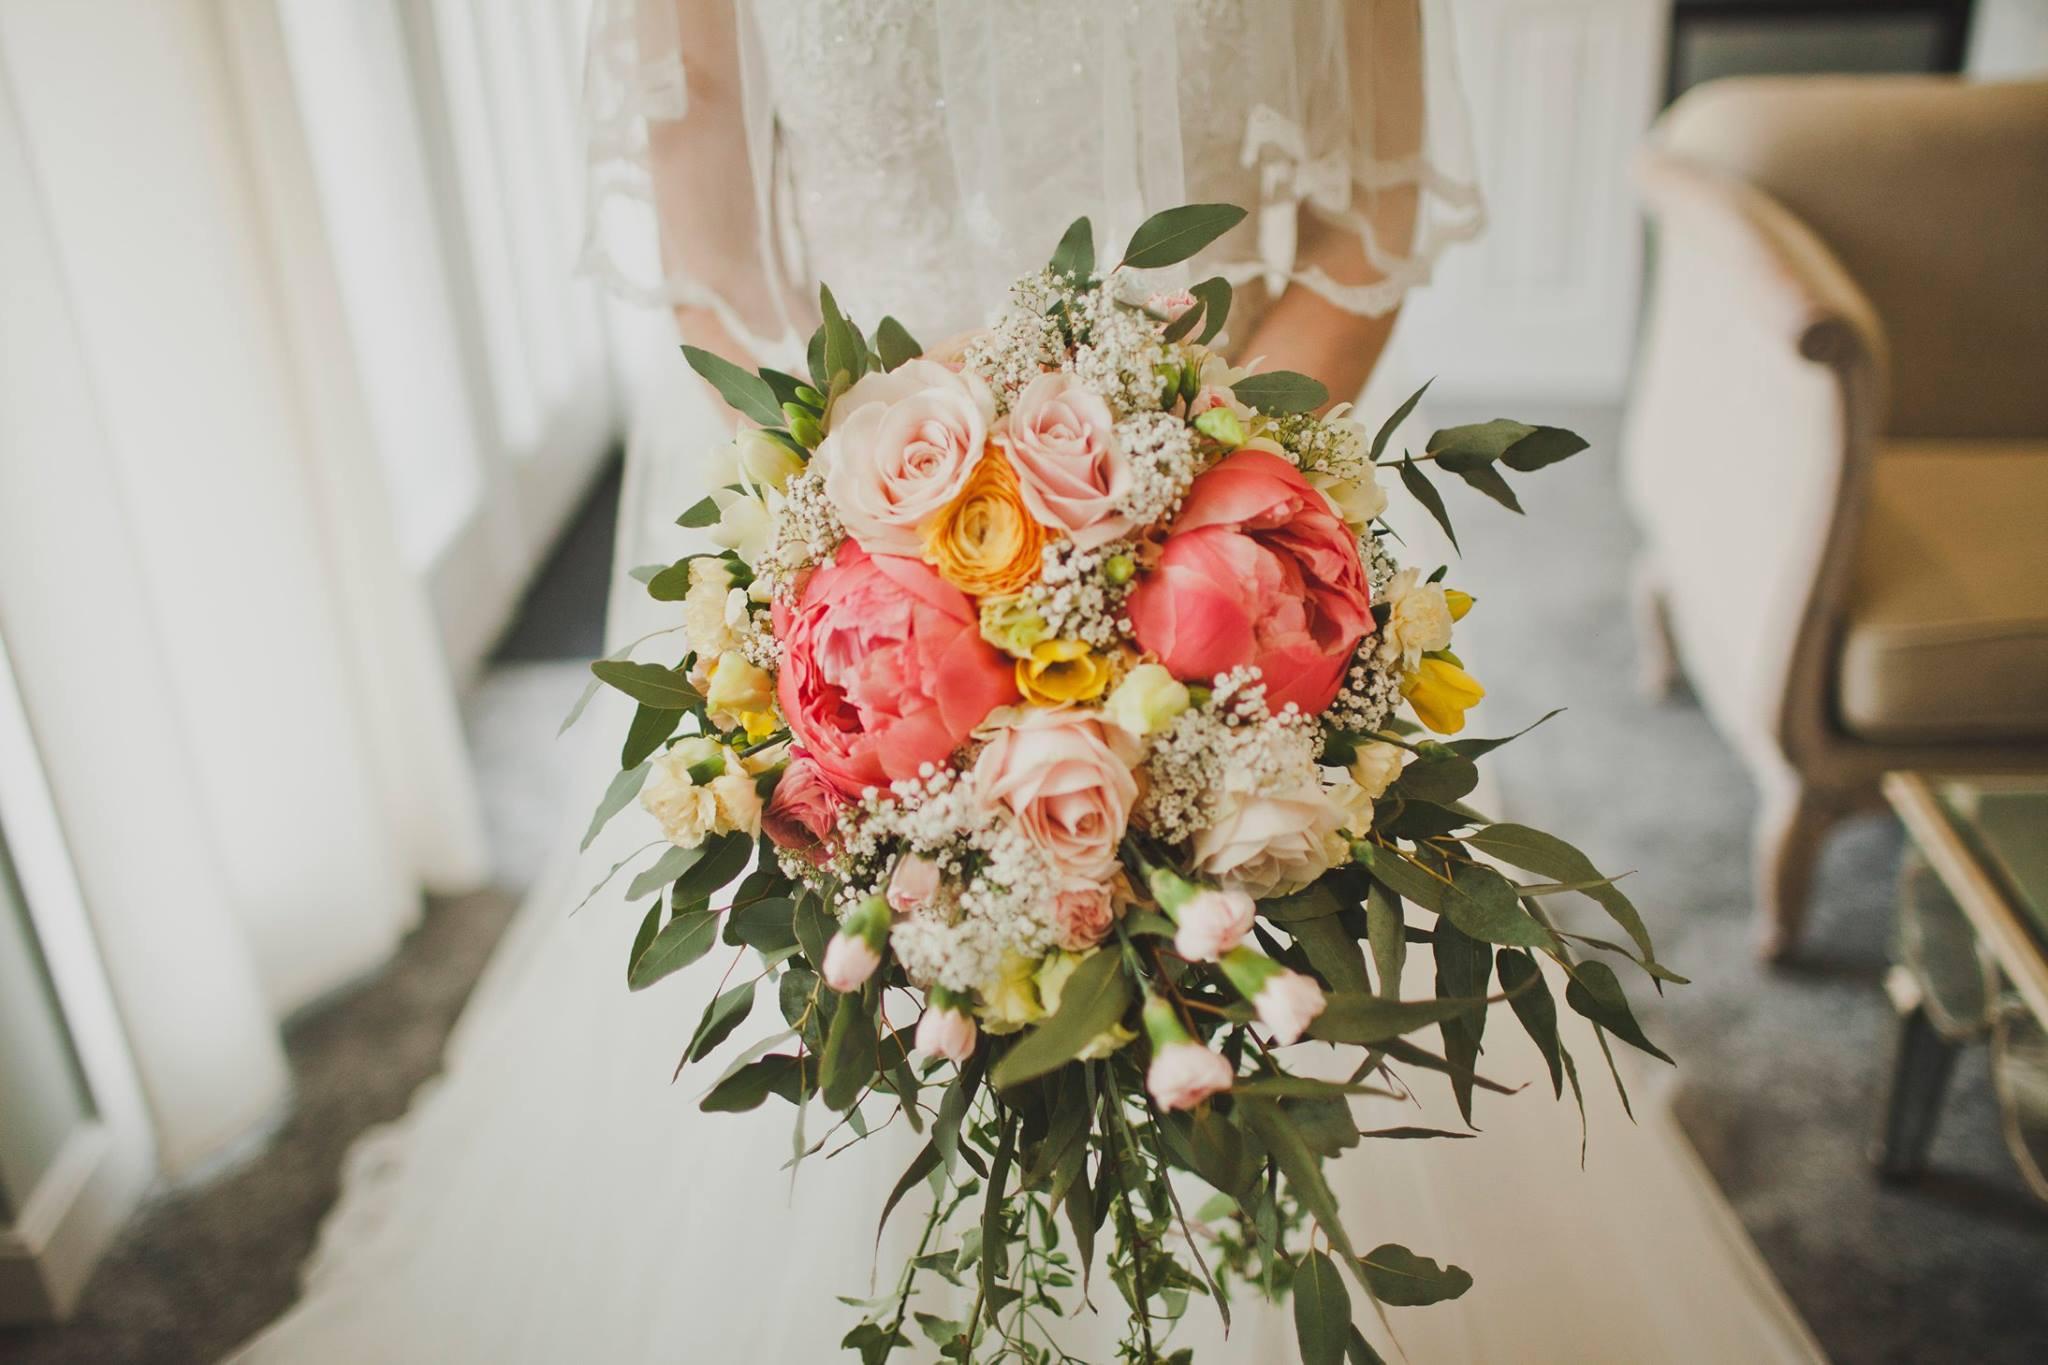 lilac_thyme-wedding_boquet_ororange.jpeg